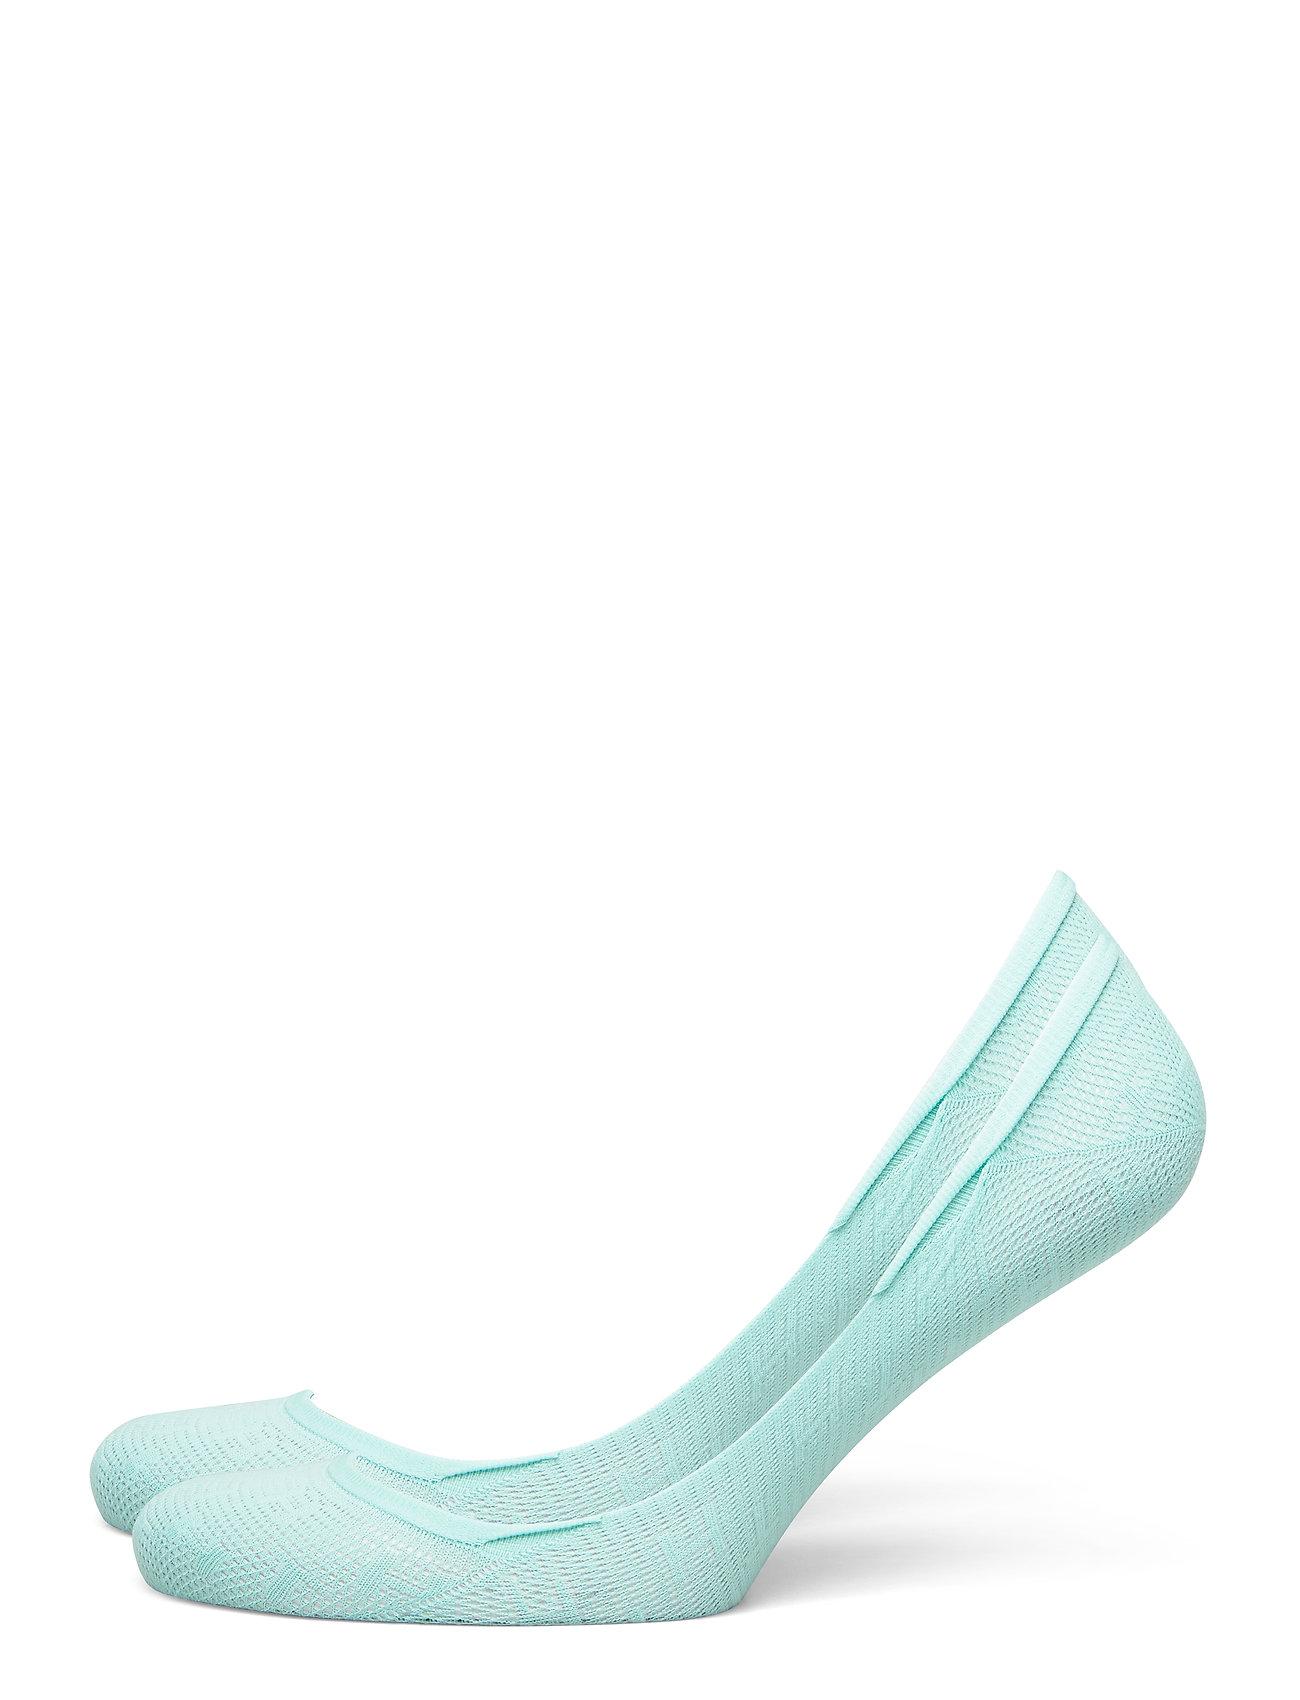 Image of Th Women Footie 2p Th Burn Out Lingerie Socks Footies/Ankle Socks Blå Tommy Hilfiger (3416359981)